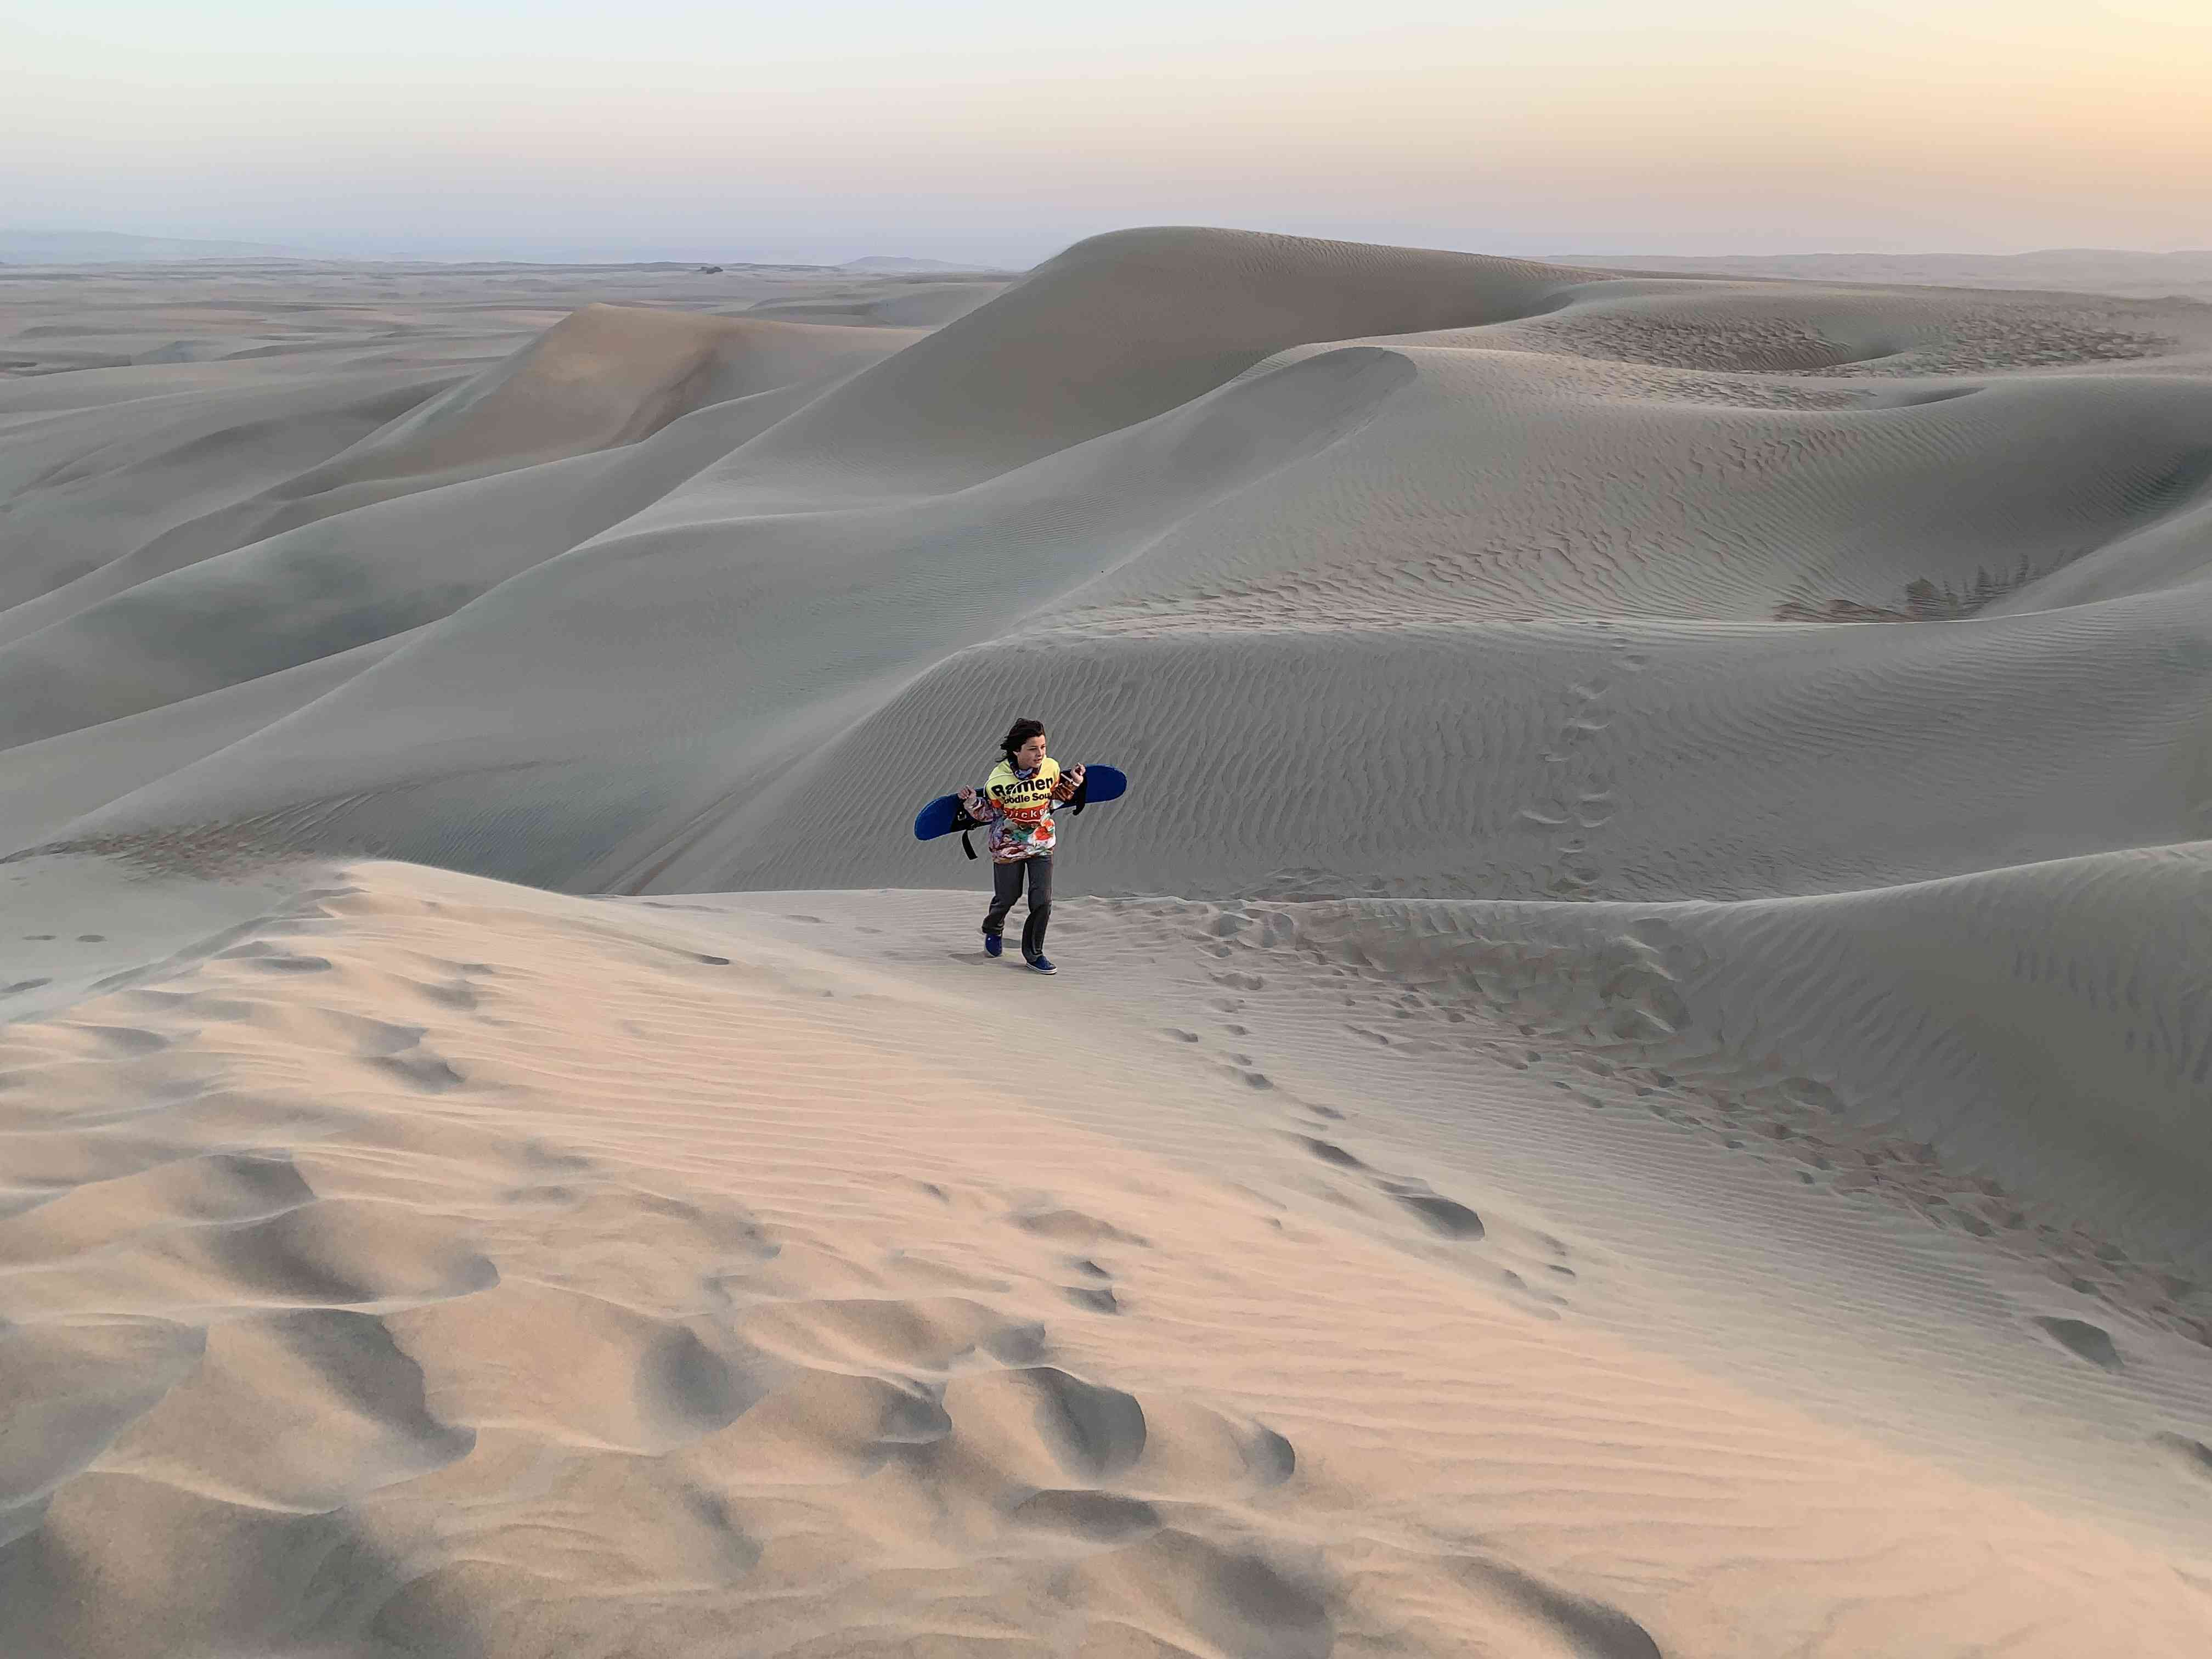 Sand Boarding in Paracas, Peru